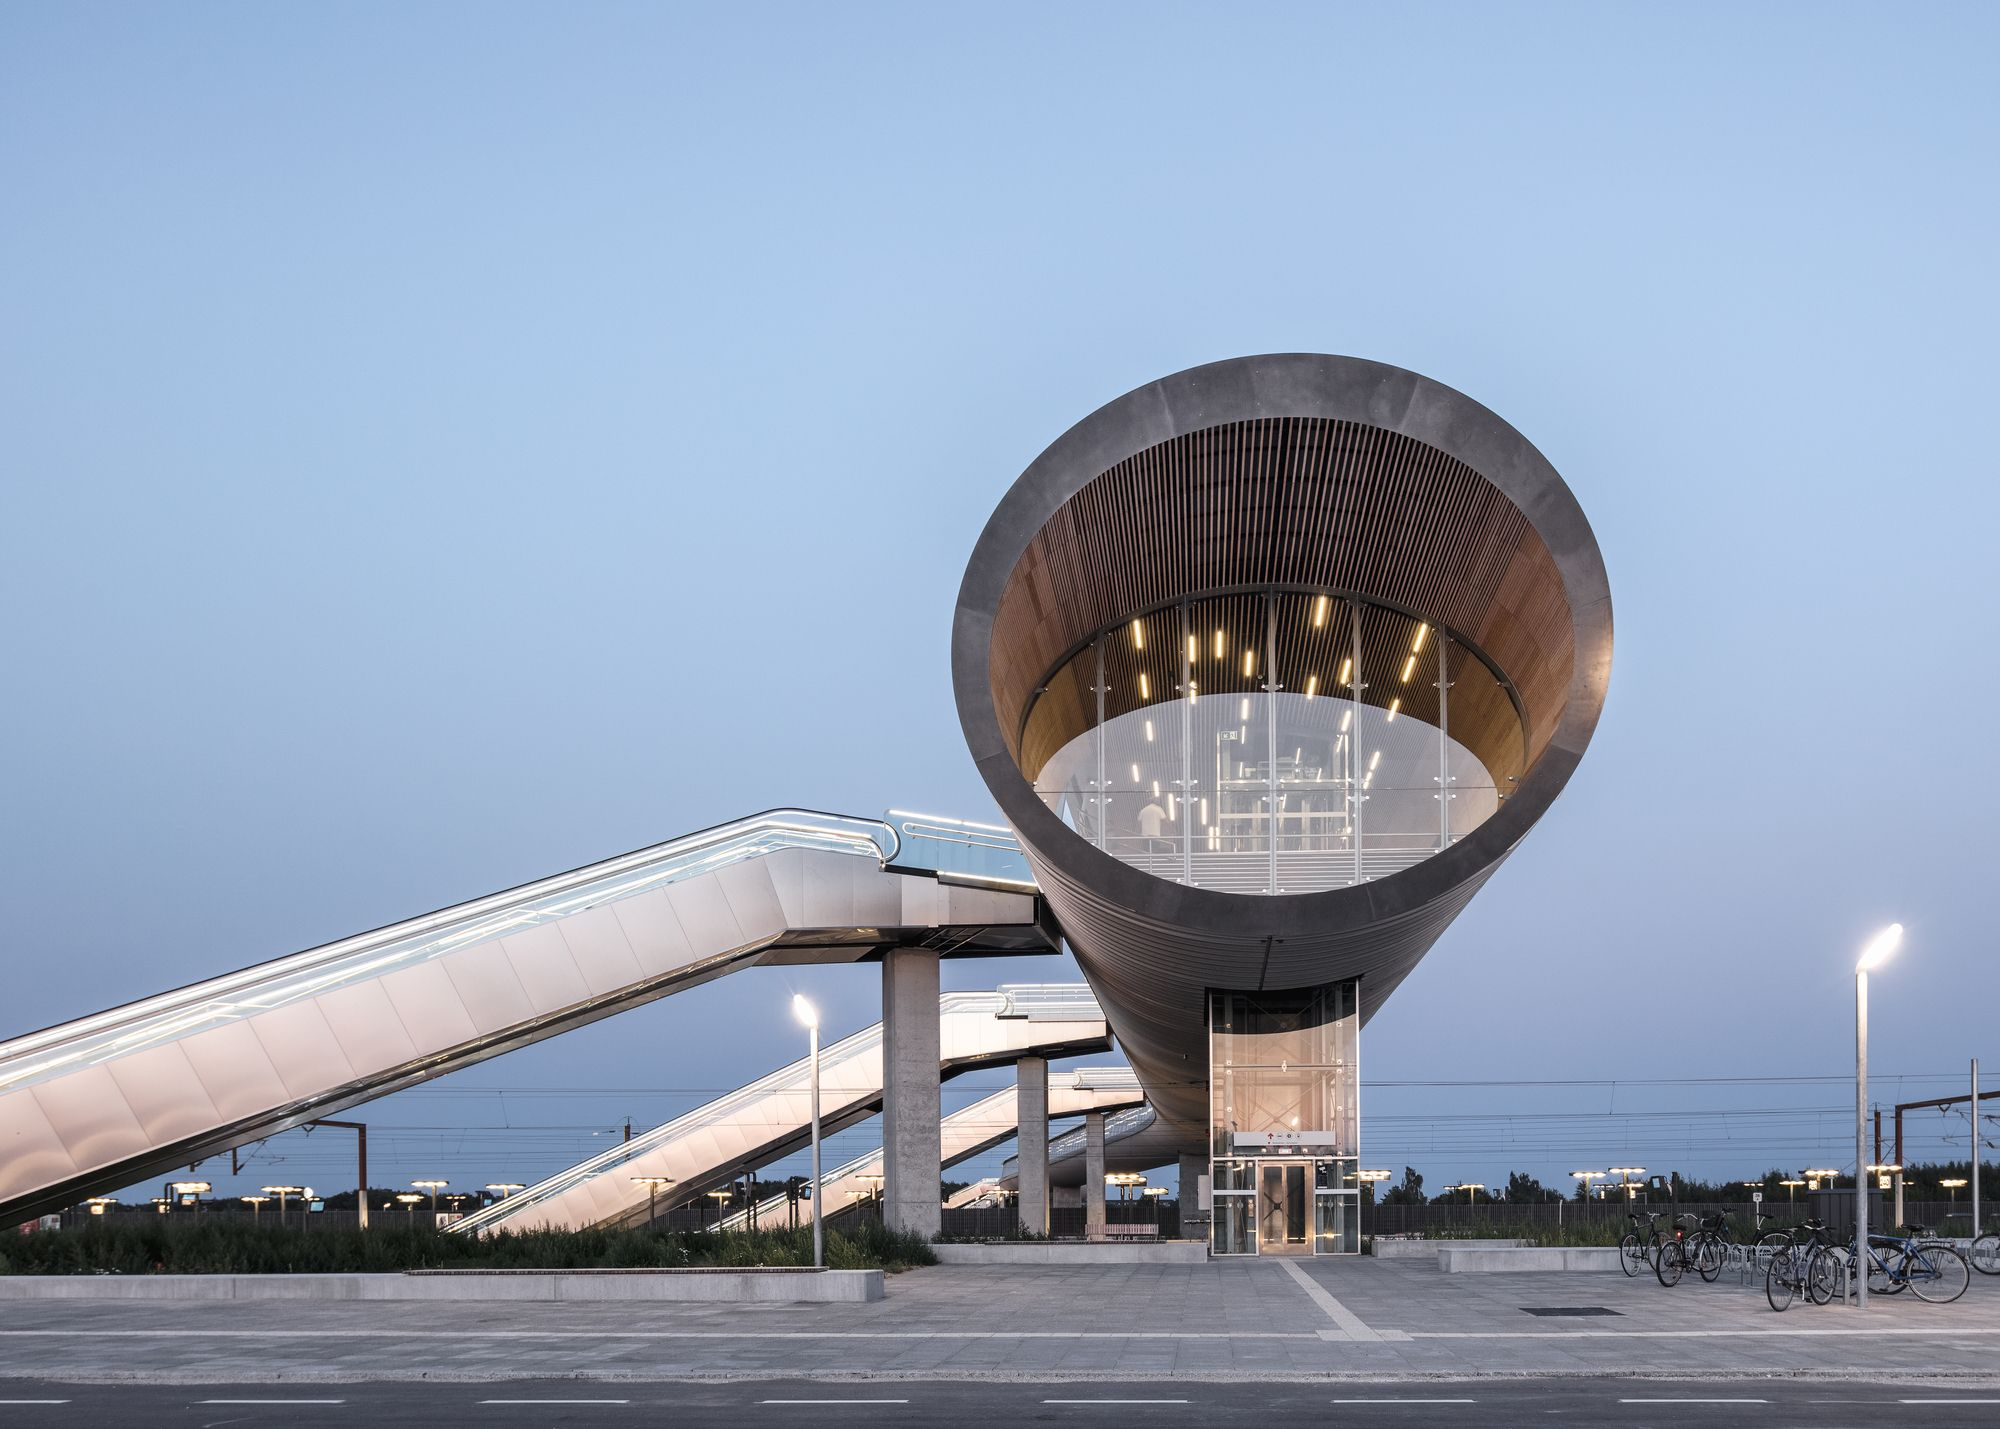 Pin On Arquitetura Moderna Sustentavel Arte Design Ideias